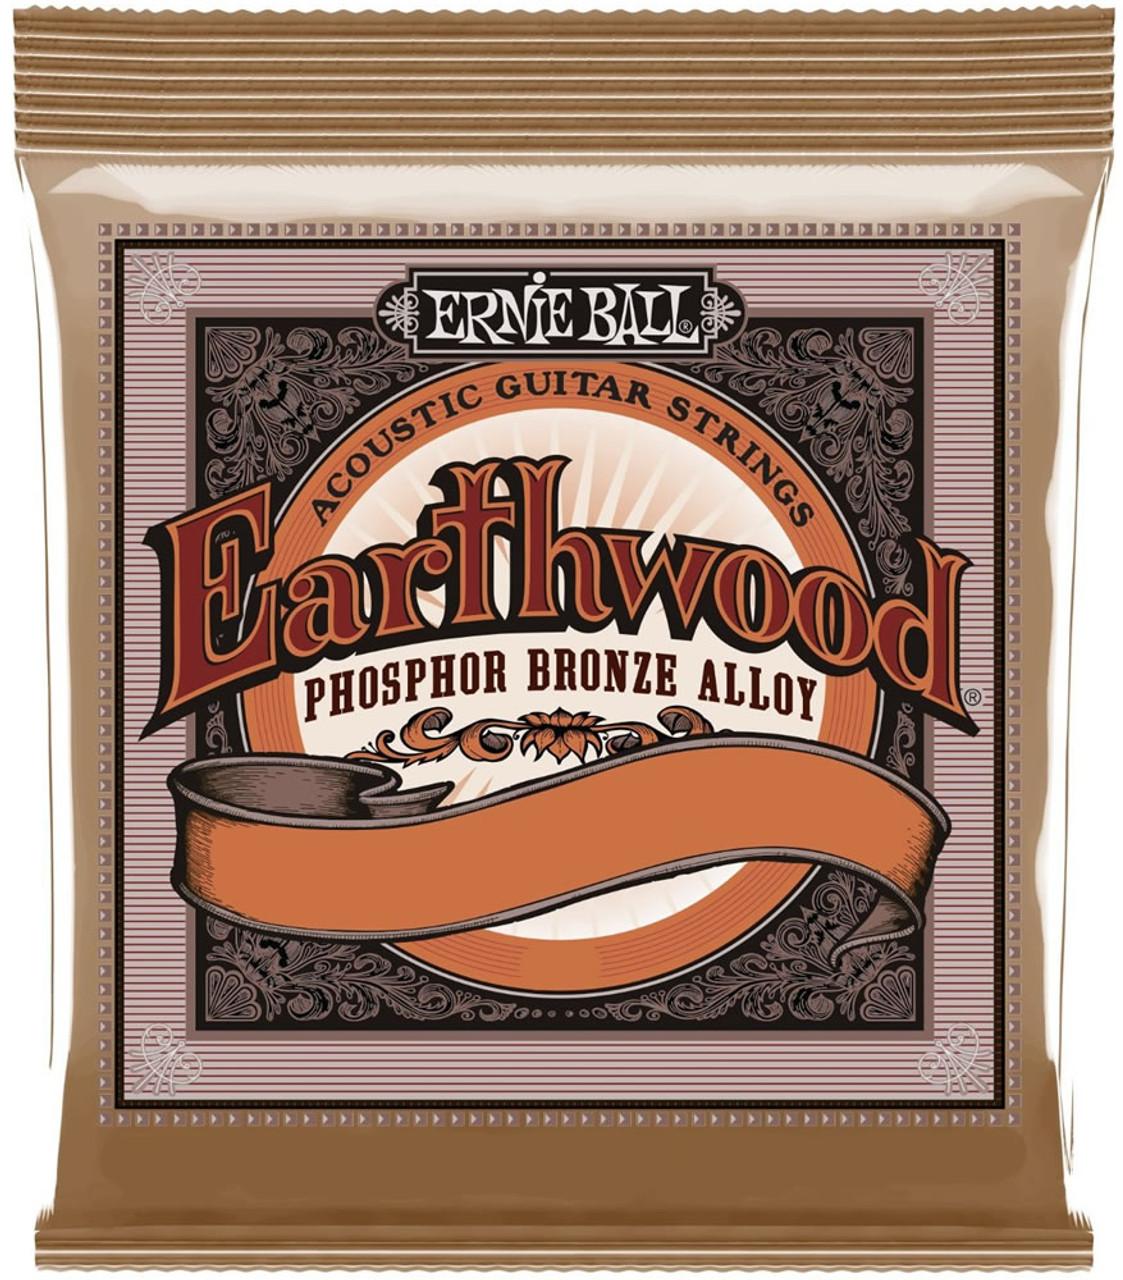 Ernie Ball Earthwood Phosphor Bronze Strings